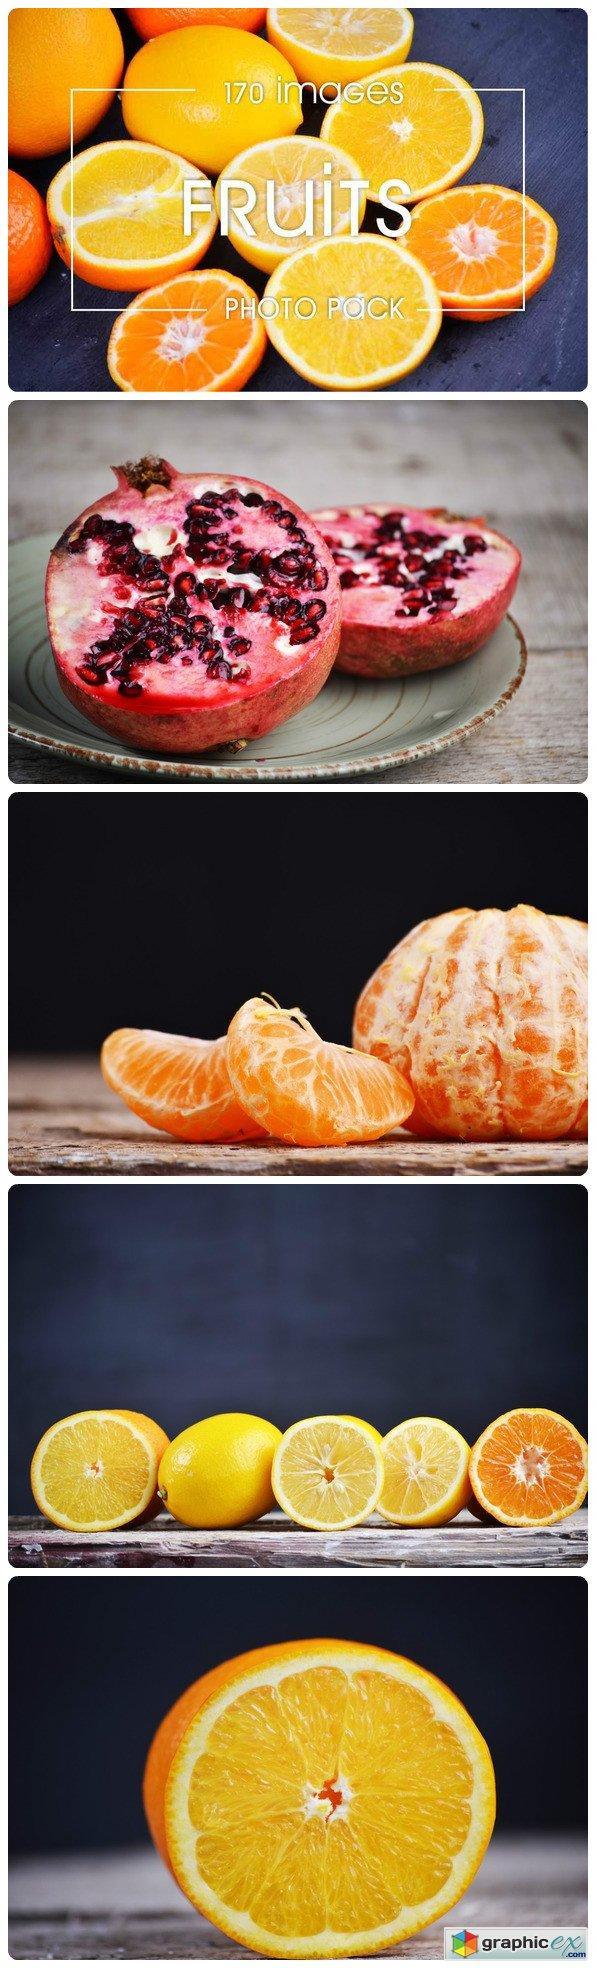 6 poster design photo mockups 57079 - Fruits Photo Pack 170 Img Mockups